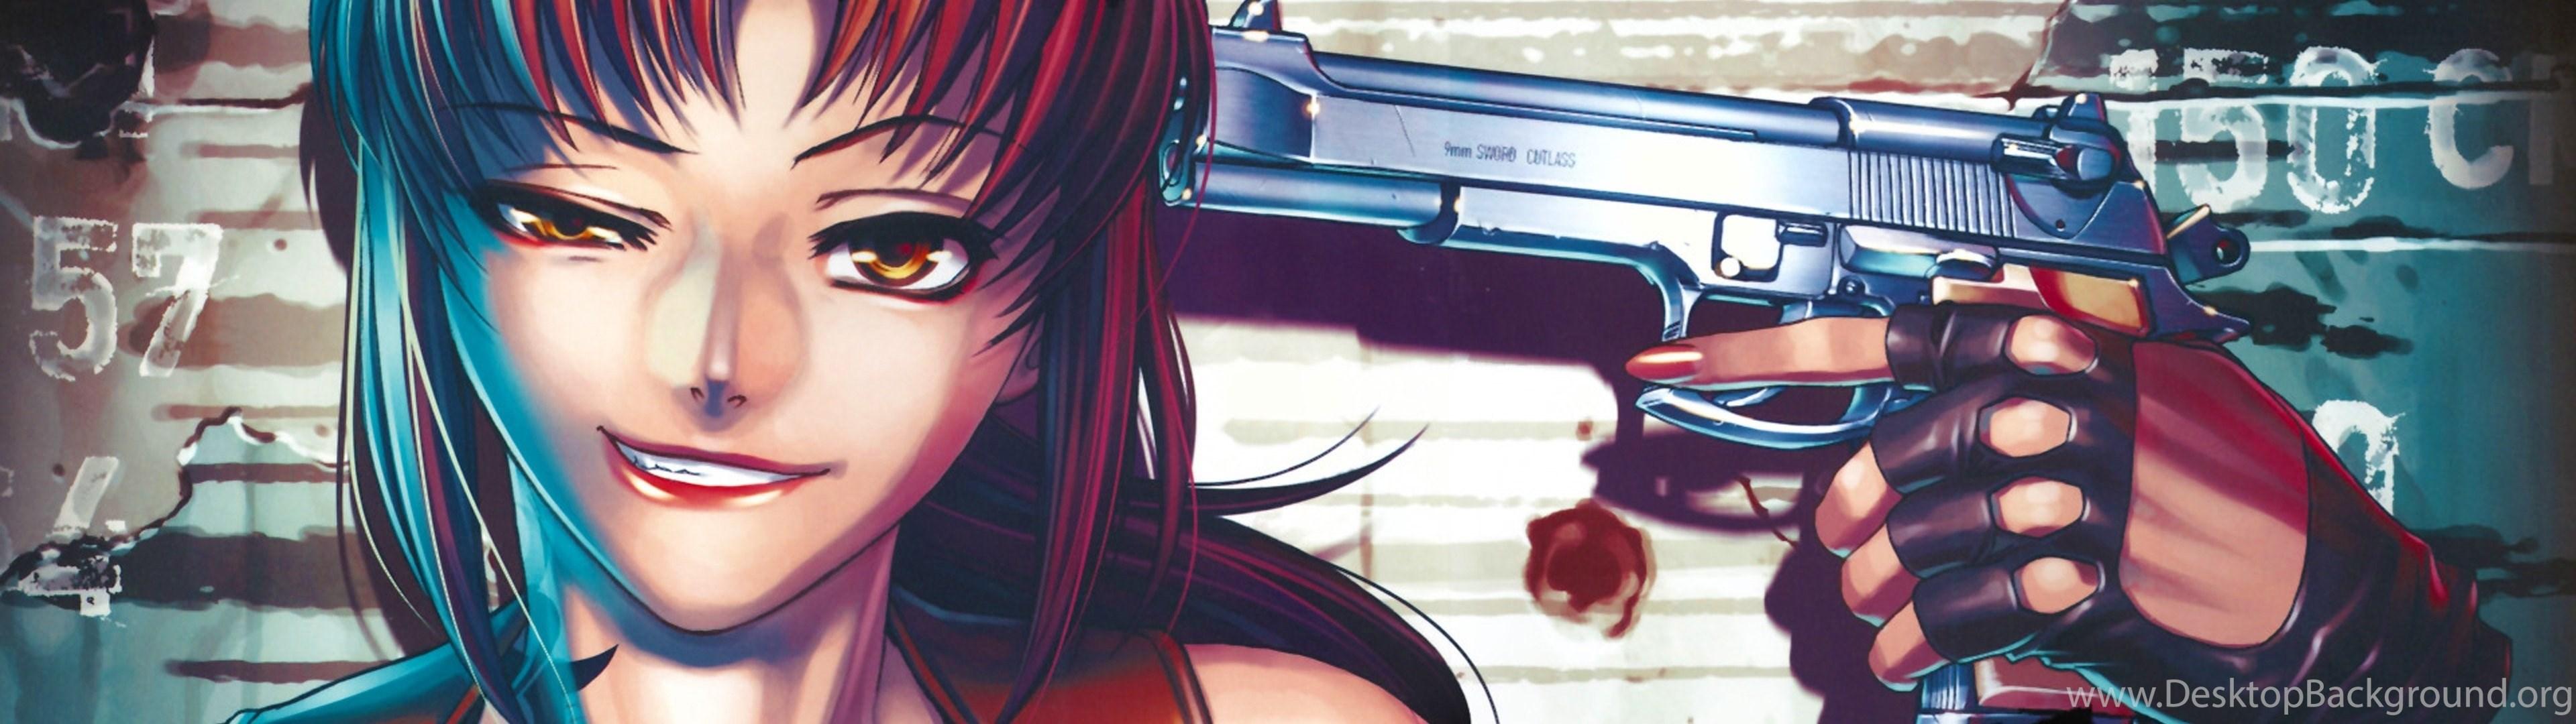 Anime Girls With Guns Wallpapers 3840x1080 Desktop Background